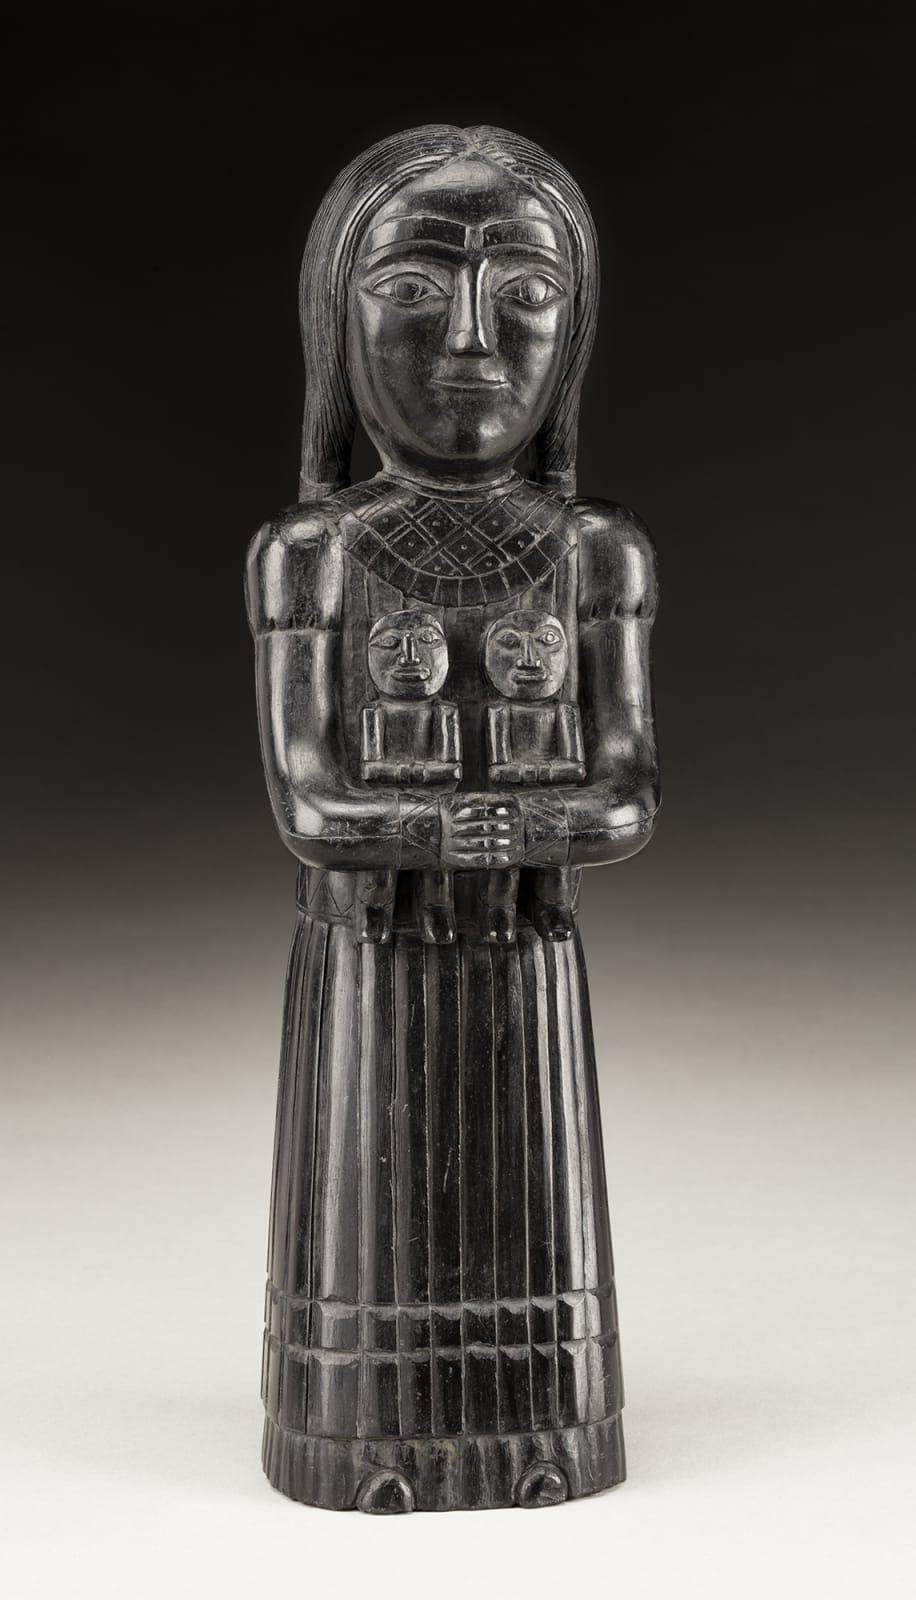 Lot 51 UNIDENTIFIED ARTIST, HAIDA Female Figure Holding Two Dolls, c. 1840-1860 argillite, 10.75 x 3.25 x 2.25 in (27.3 x 8.3 x 5.7 cm) Estimate: $18,000 — $28,000